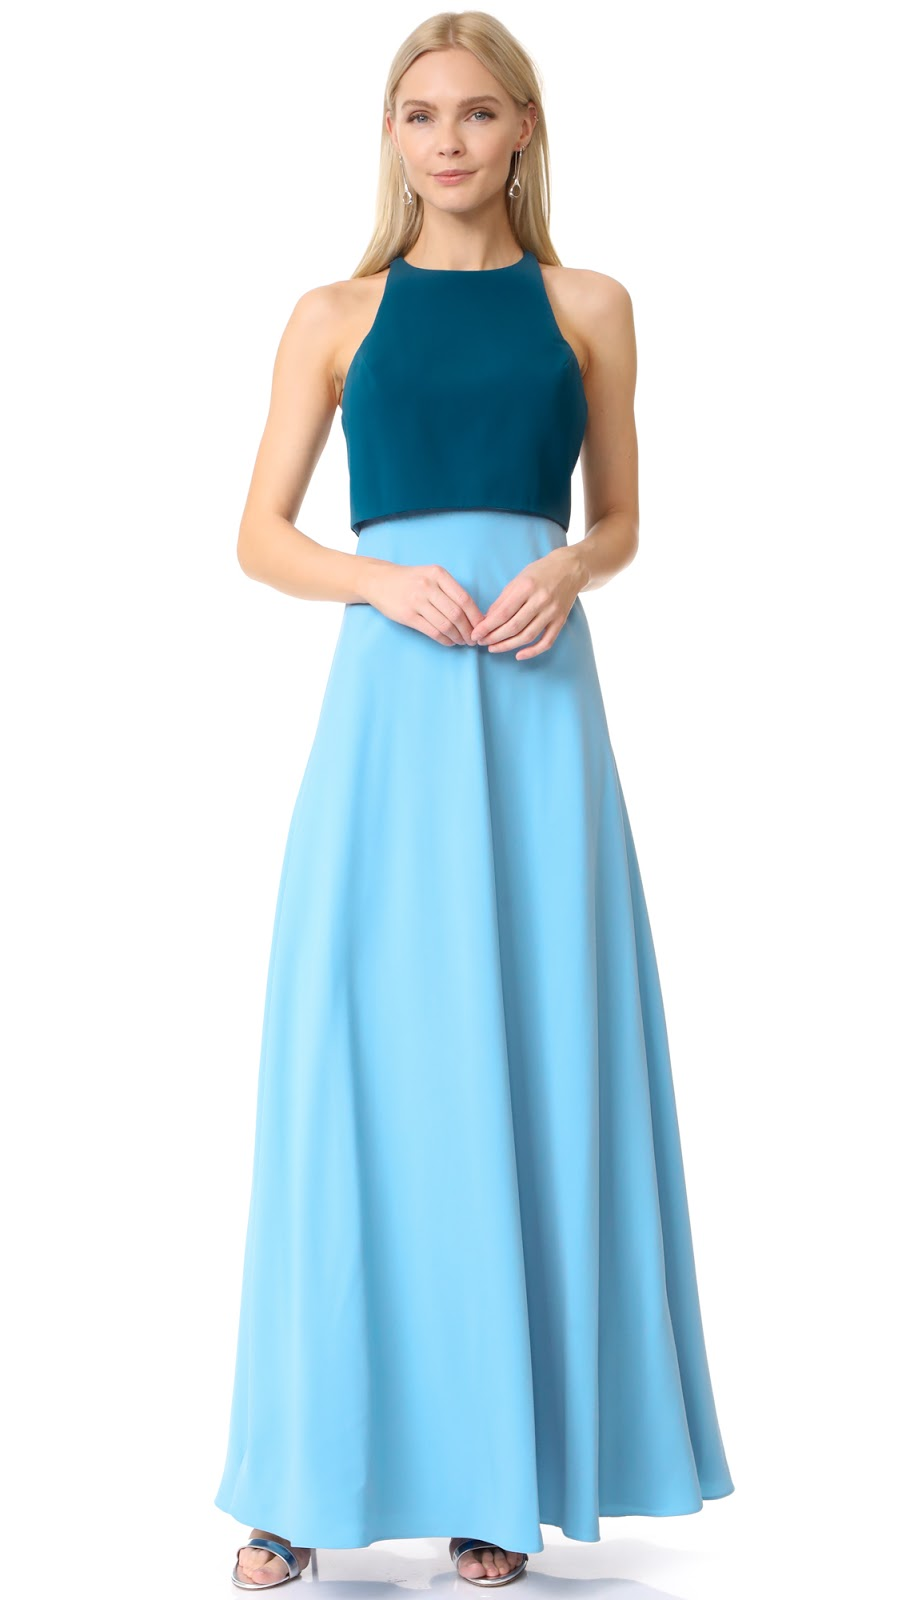 Spring Dresses | Easter + Graduation + Wedding Ideas - Designer Bags ...